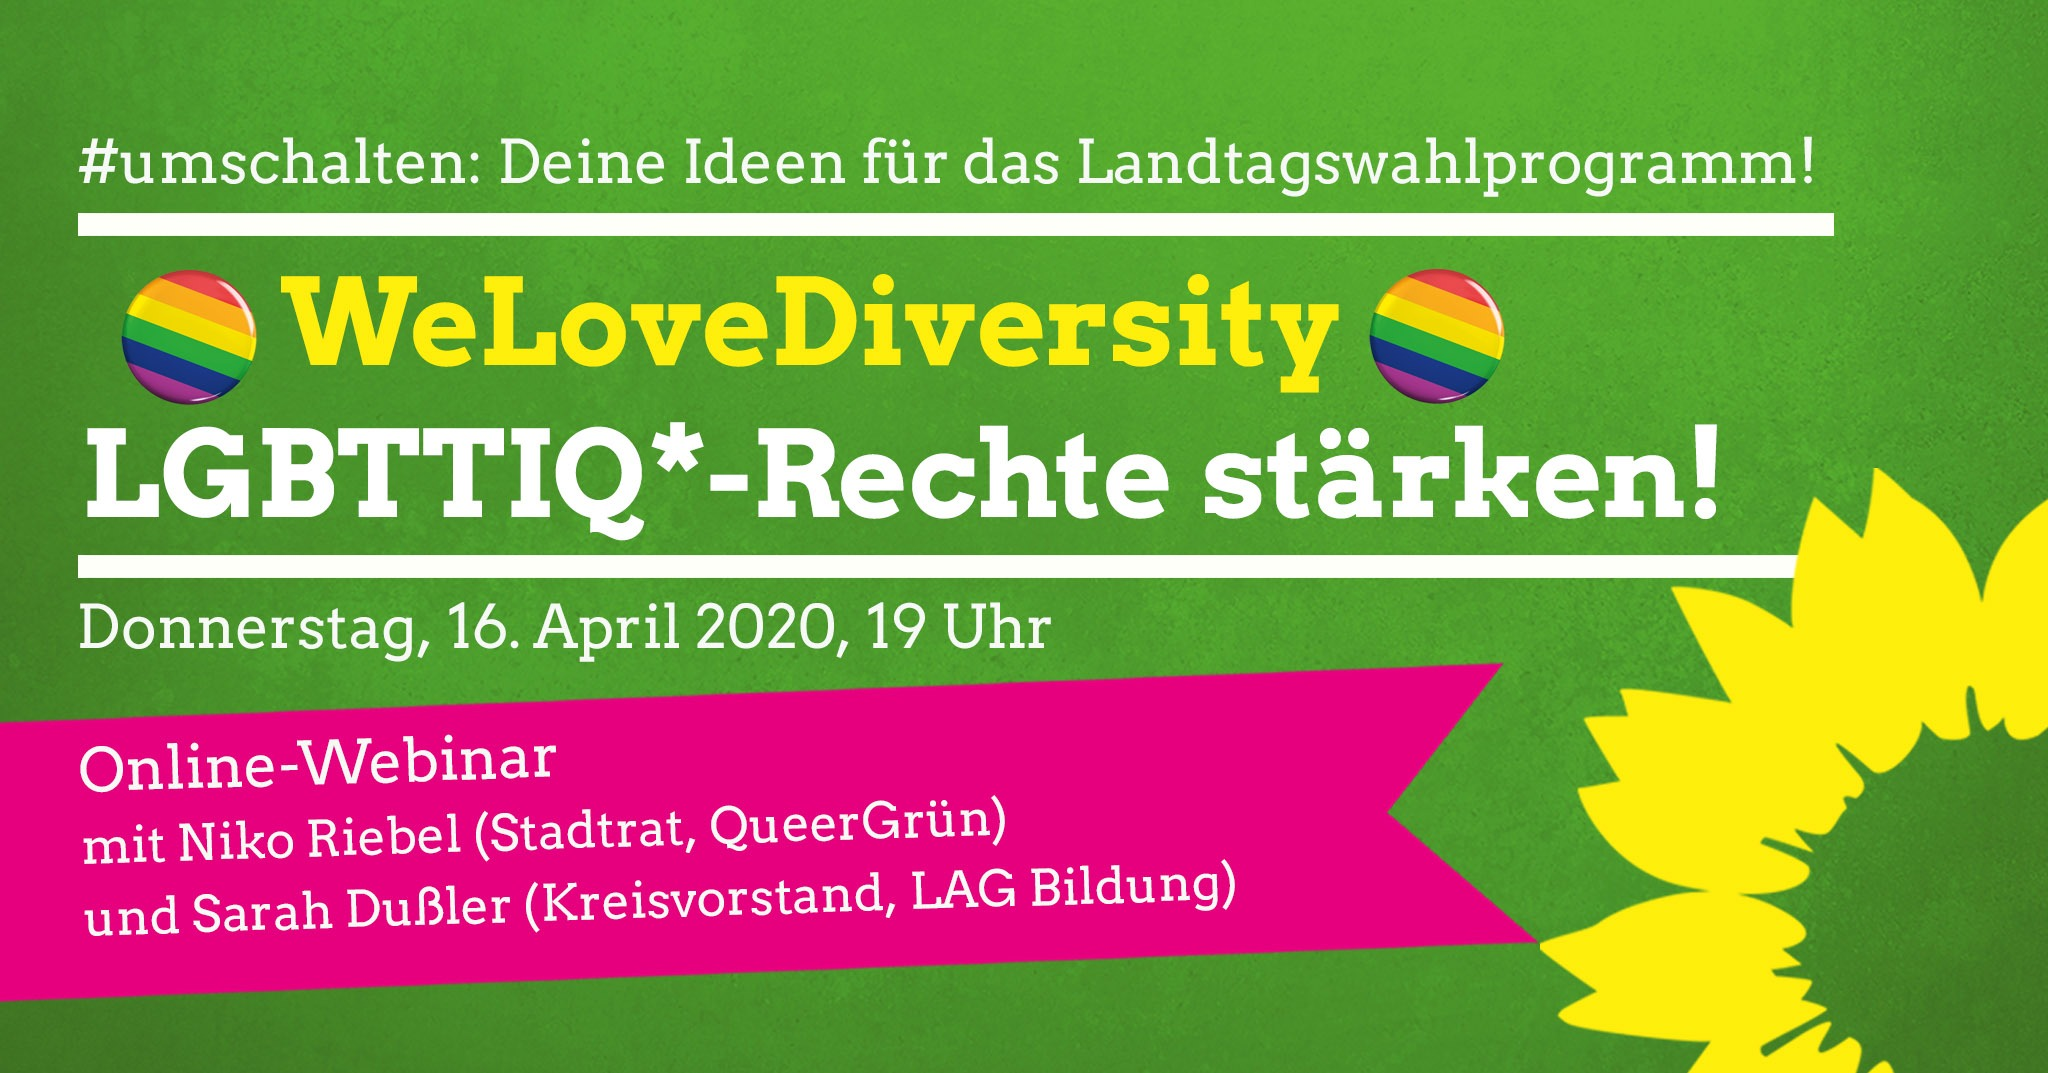 WeLoveDiversity: LGBTTIQ* stärken